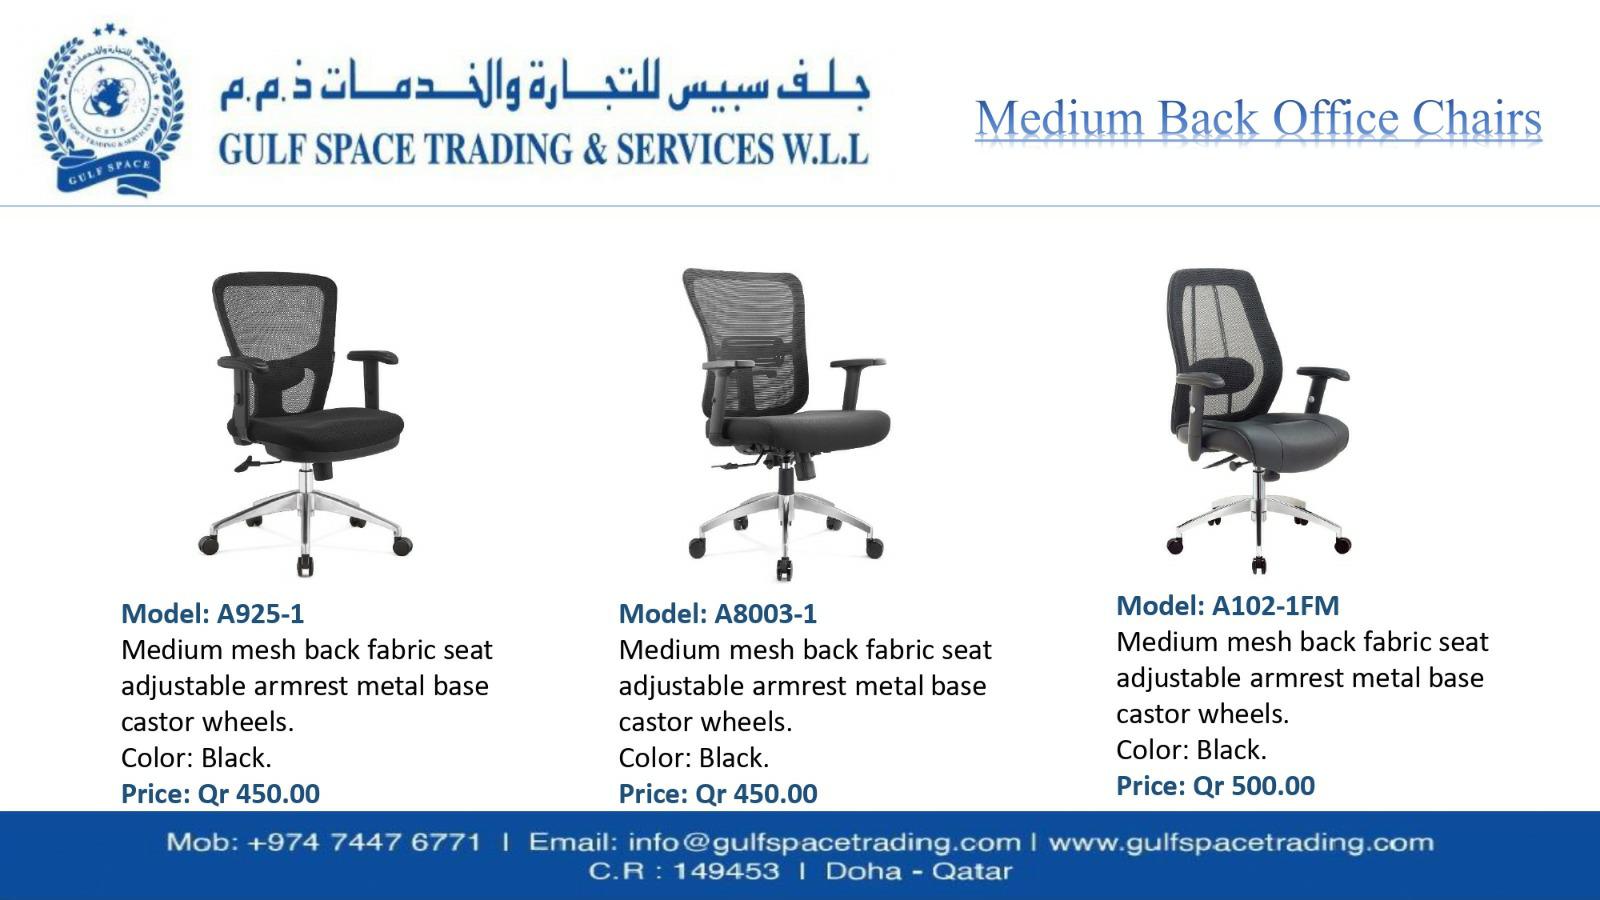 Medium back chairs